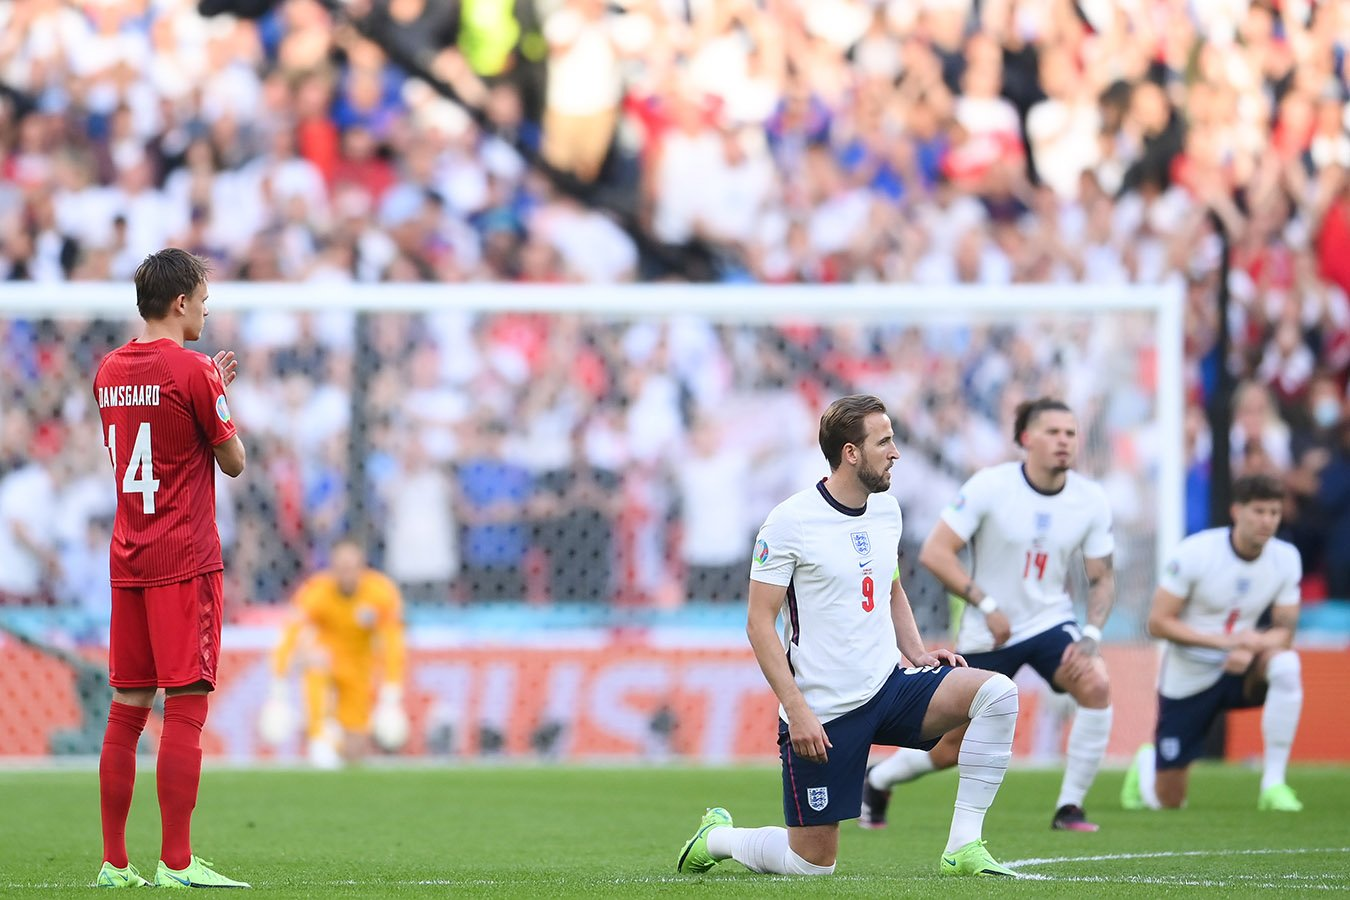 BLM на Евро 2021 - преклонение колен игроками сборных